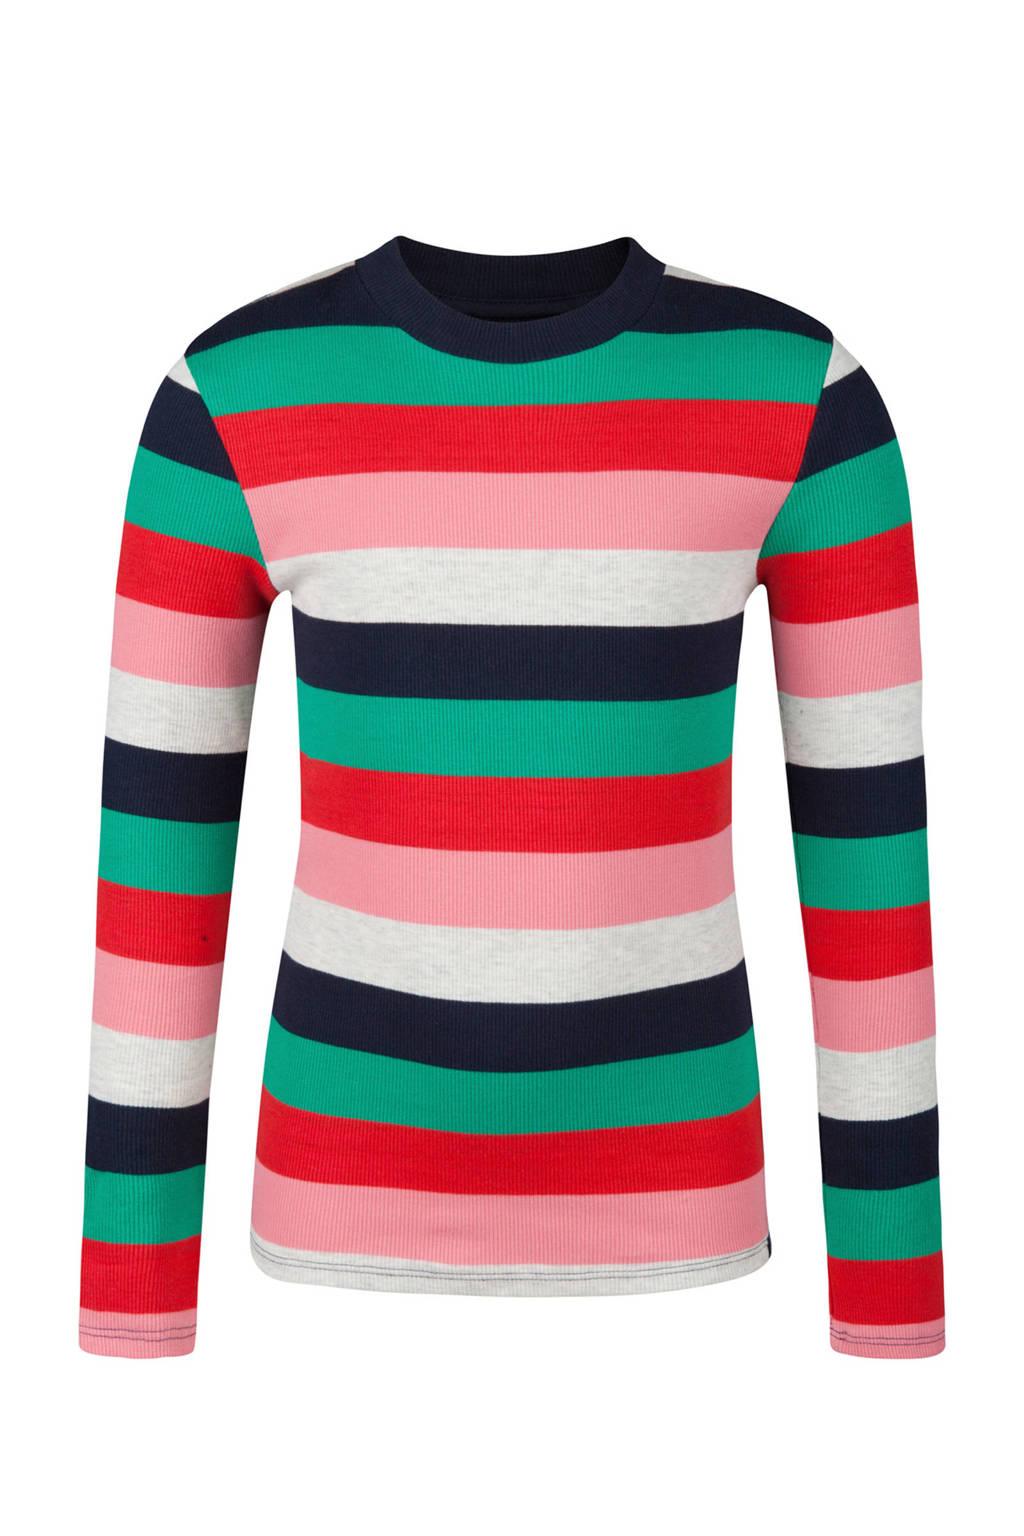 WE Fashion T-shirt gestreept, Marine/ roze/ rood/ groen